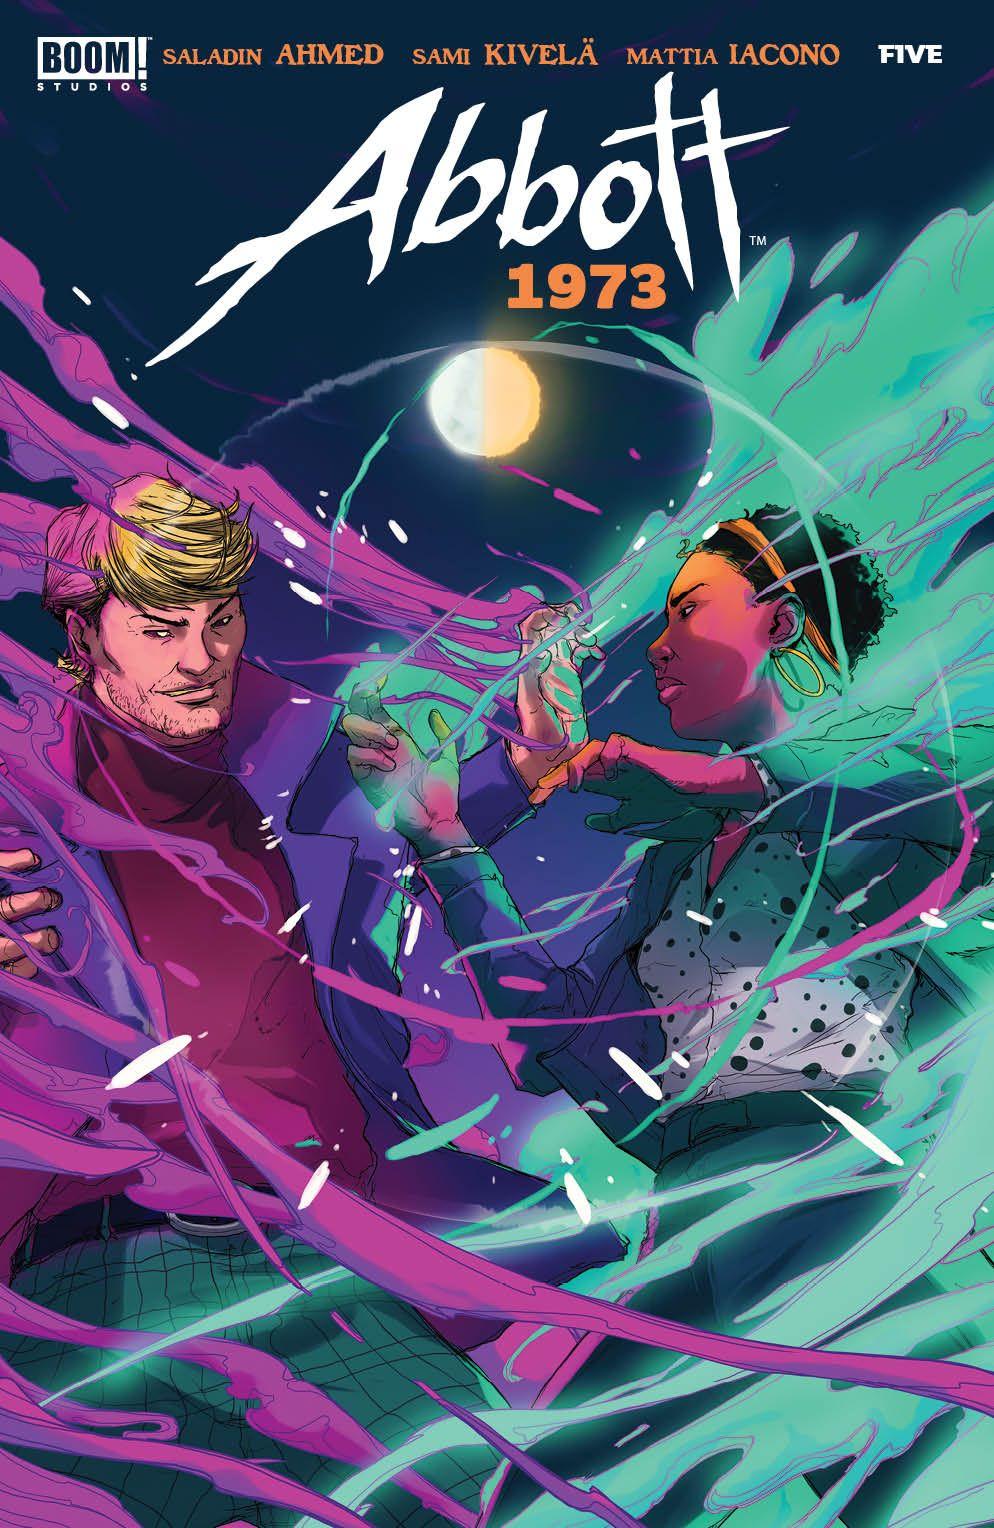 Abbott_1973_005_Cover_A_Main ComicList: BOOM! Studios New Releases for 05/26/2021